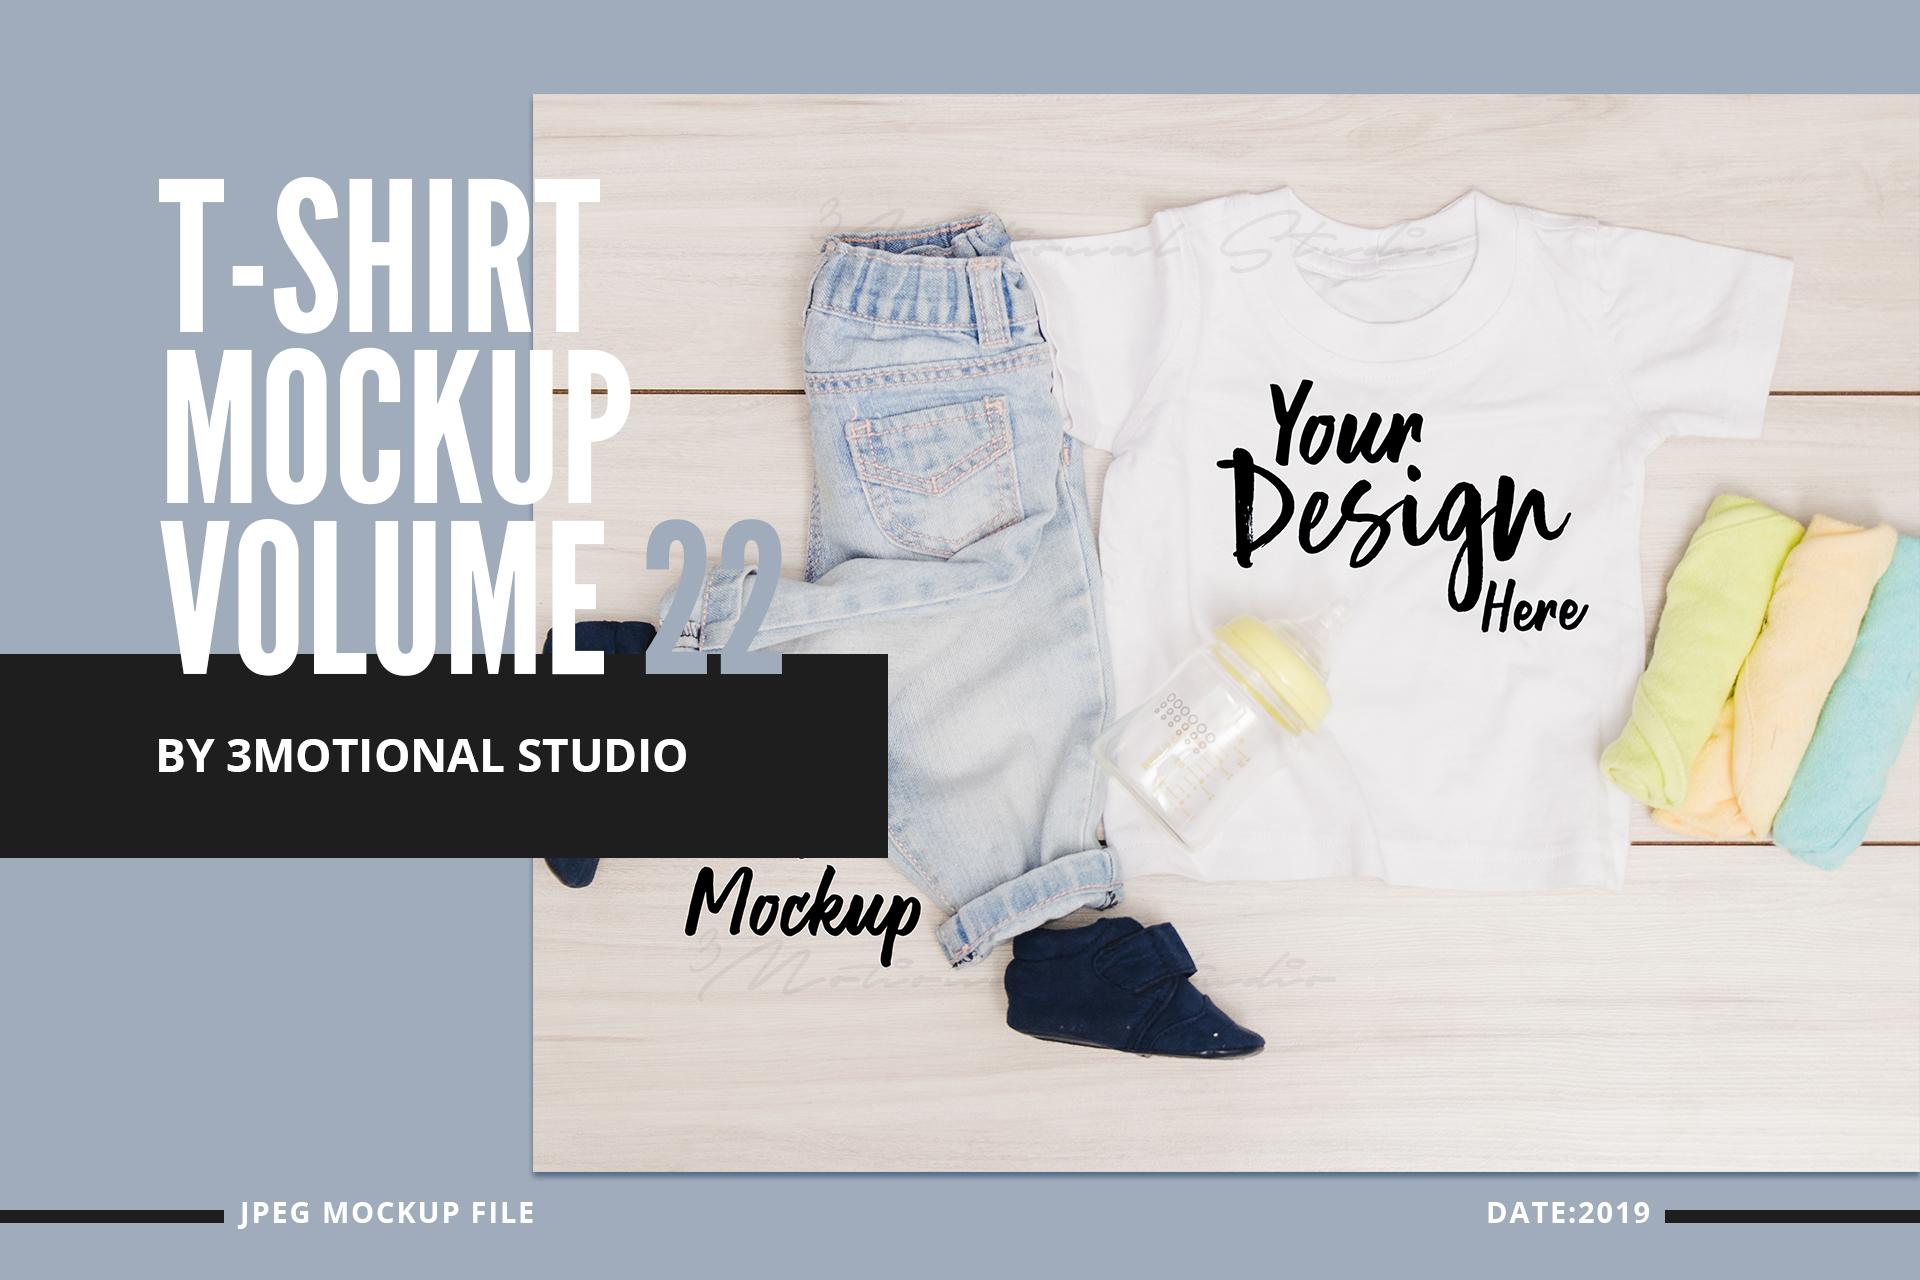 Neo T-Shirt Mockup Volume 22 example image 1